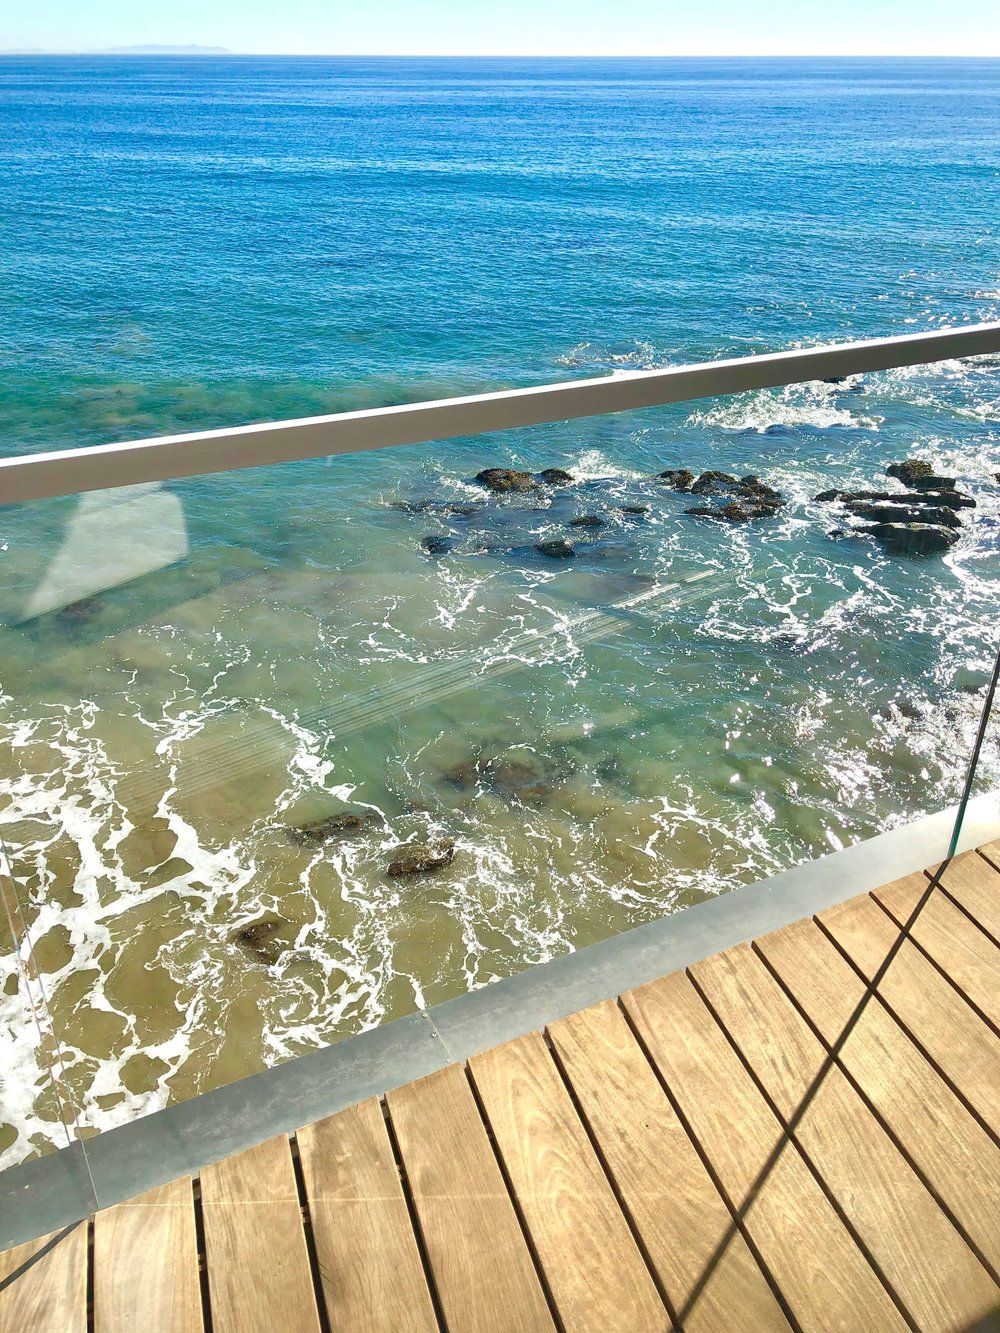 Malibu Home Tours - Dwell by Design, Architect Lorcan O'Herlihy #contemporaryarchitecture